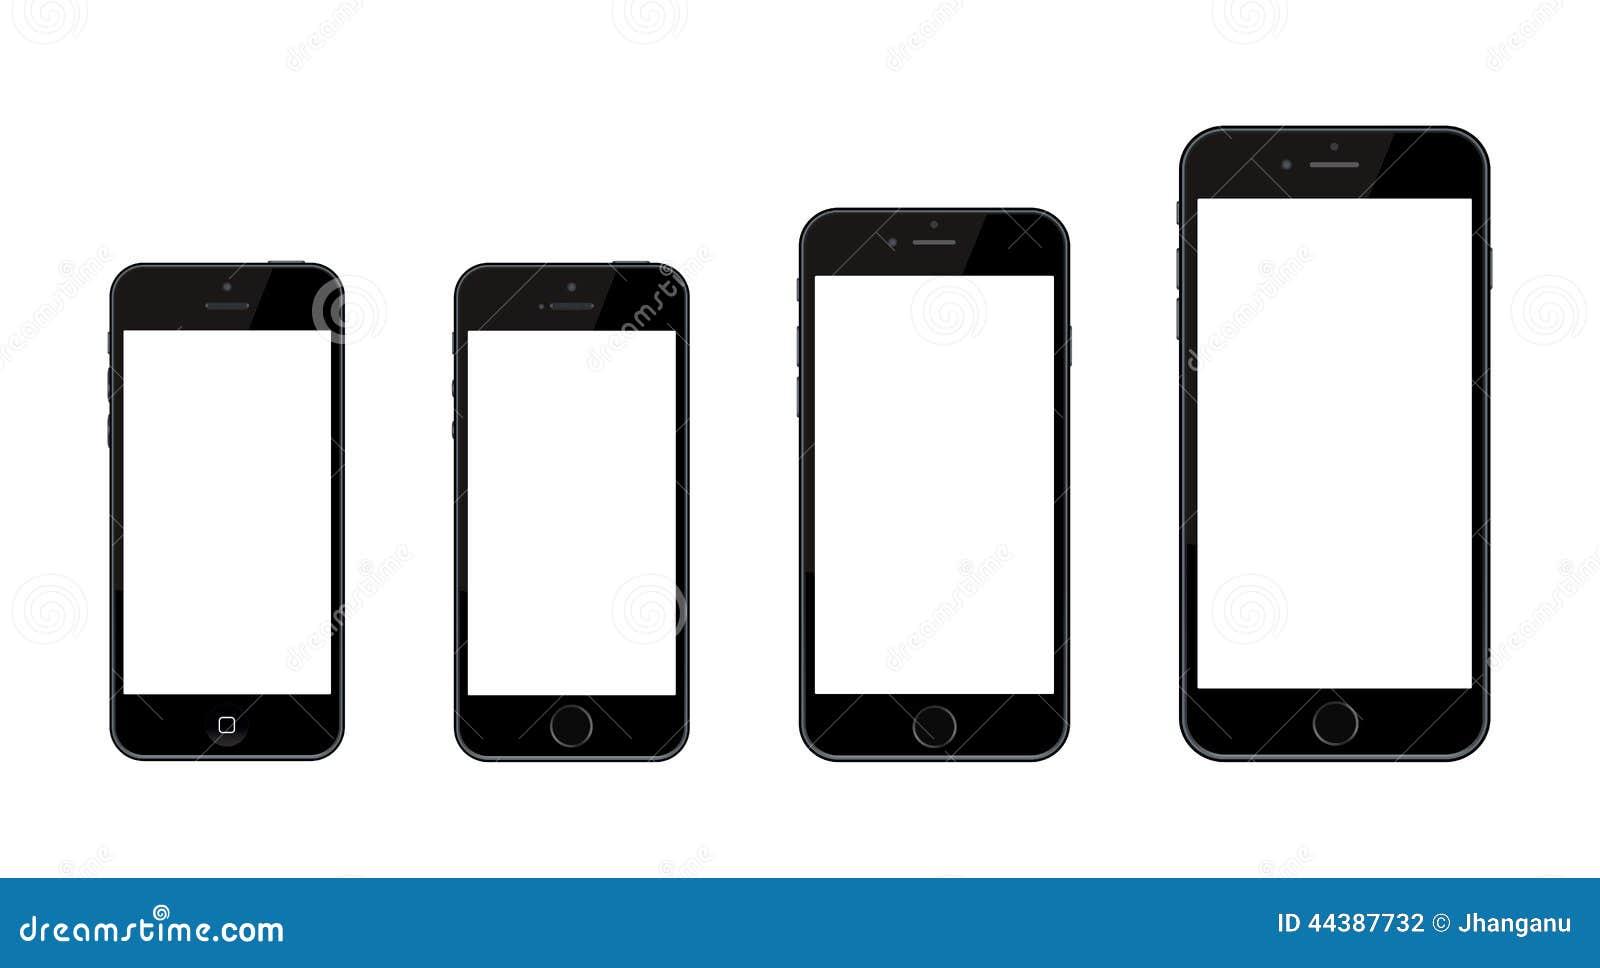 Nuovo iPhone 6 di Apple e iPhone 6 più e iPhone 5